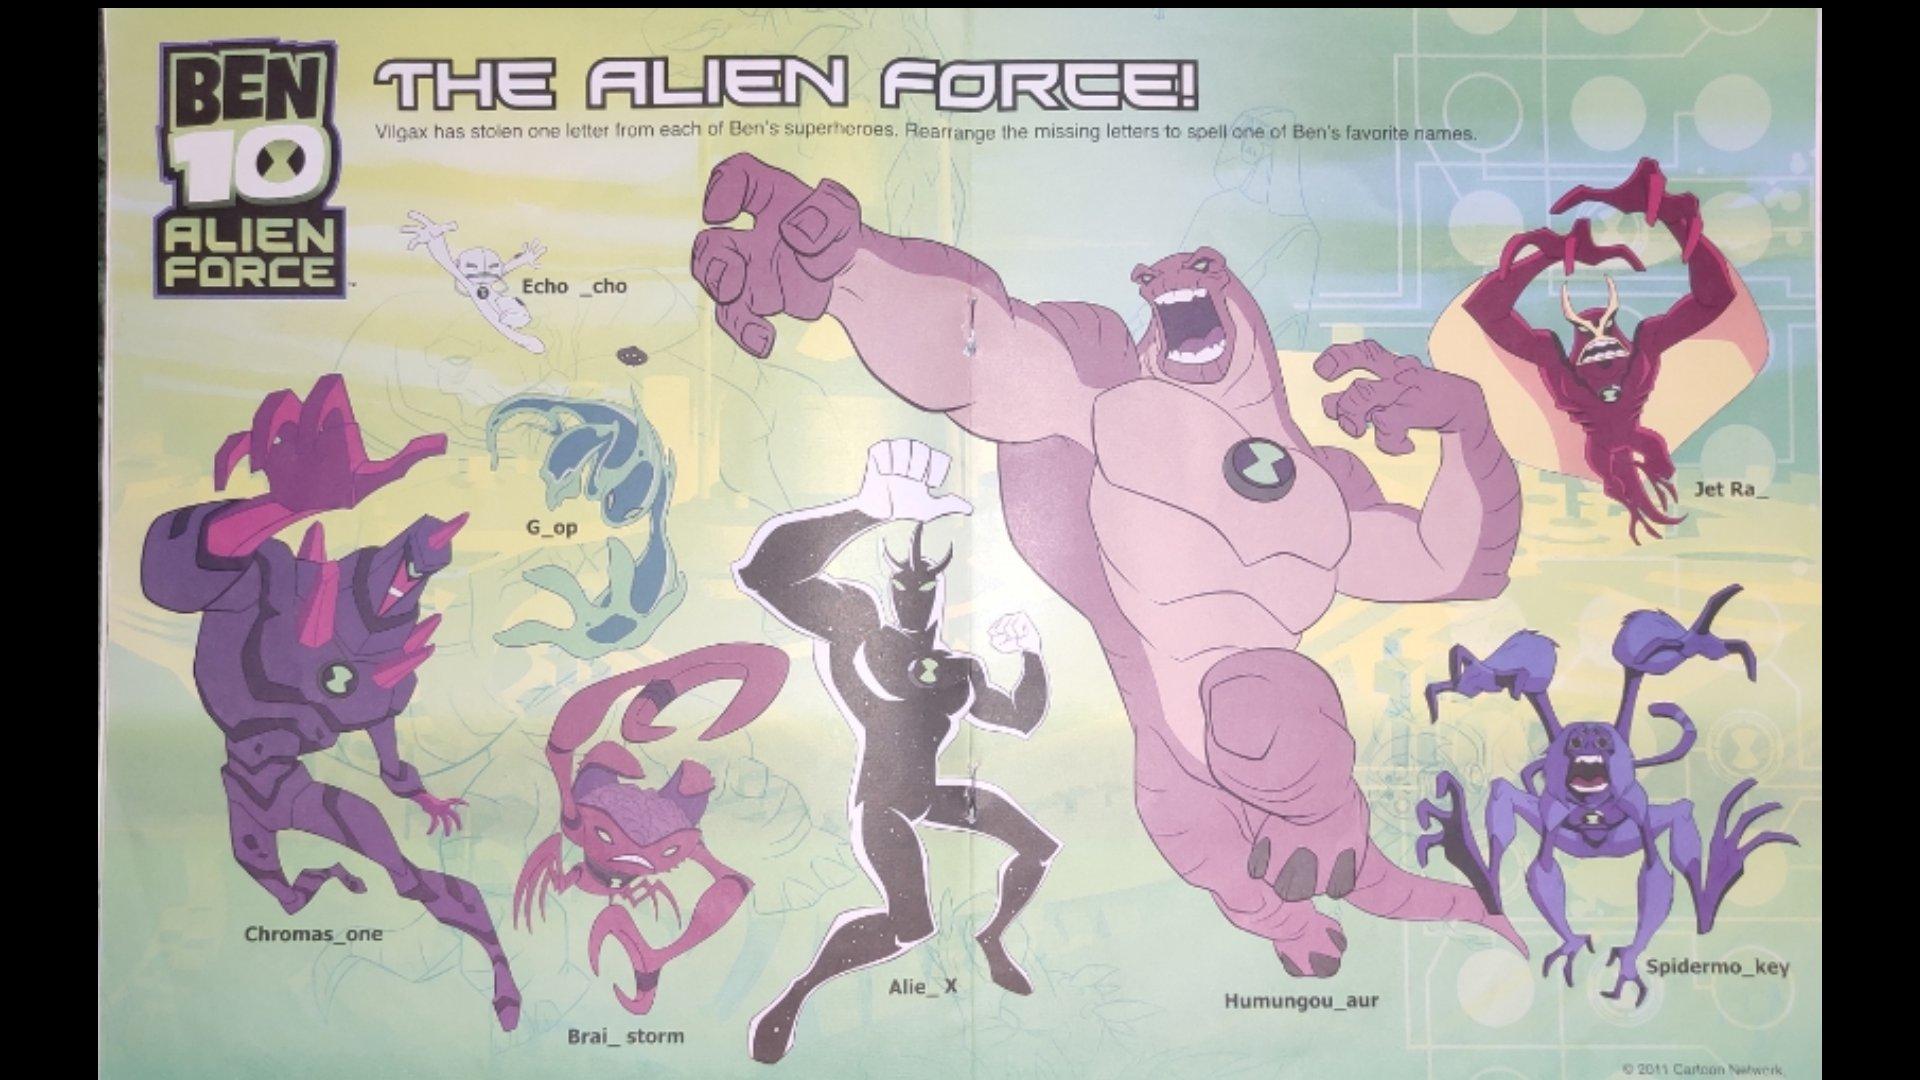 The Alien Force